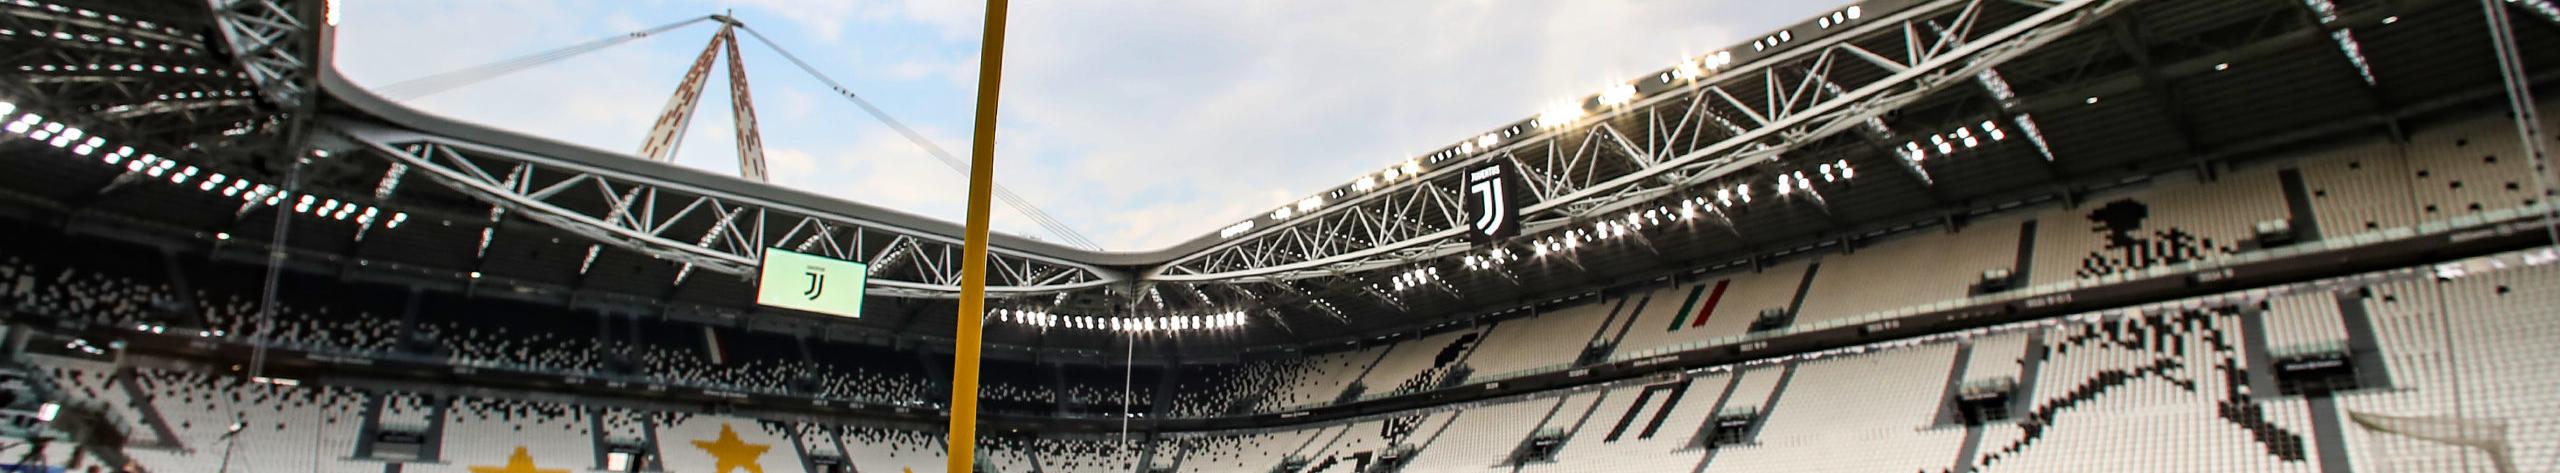 Pronostico Juventus-Torino: dubbio in regia per Sarri, Toro con il 3-5-2 - le ultimissime